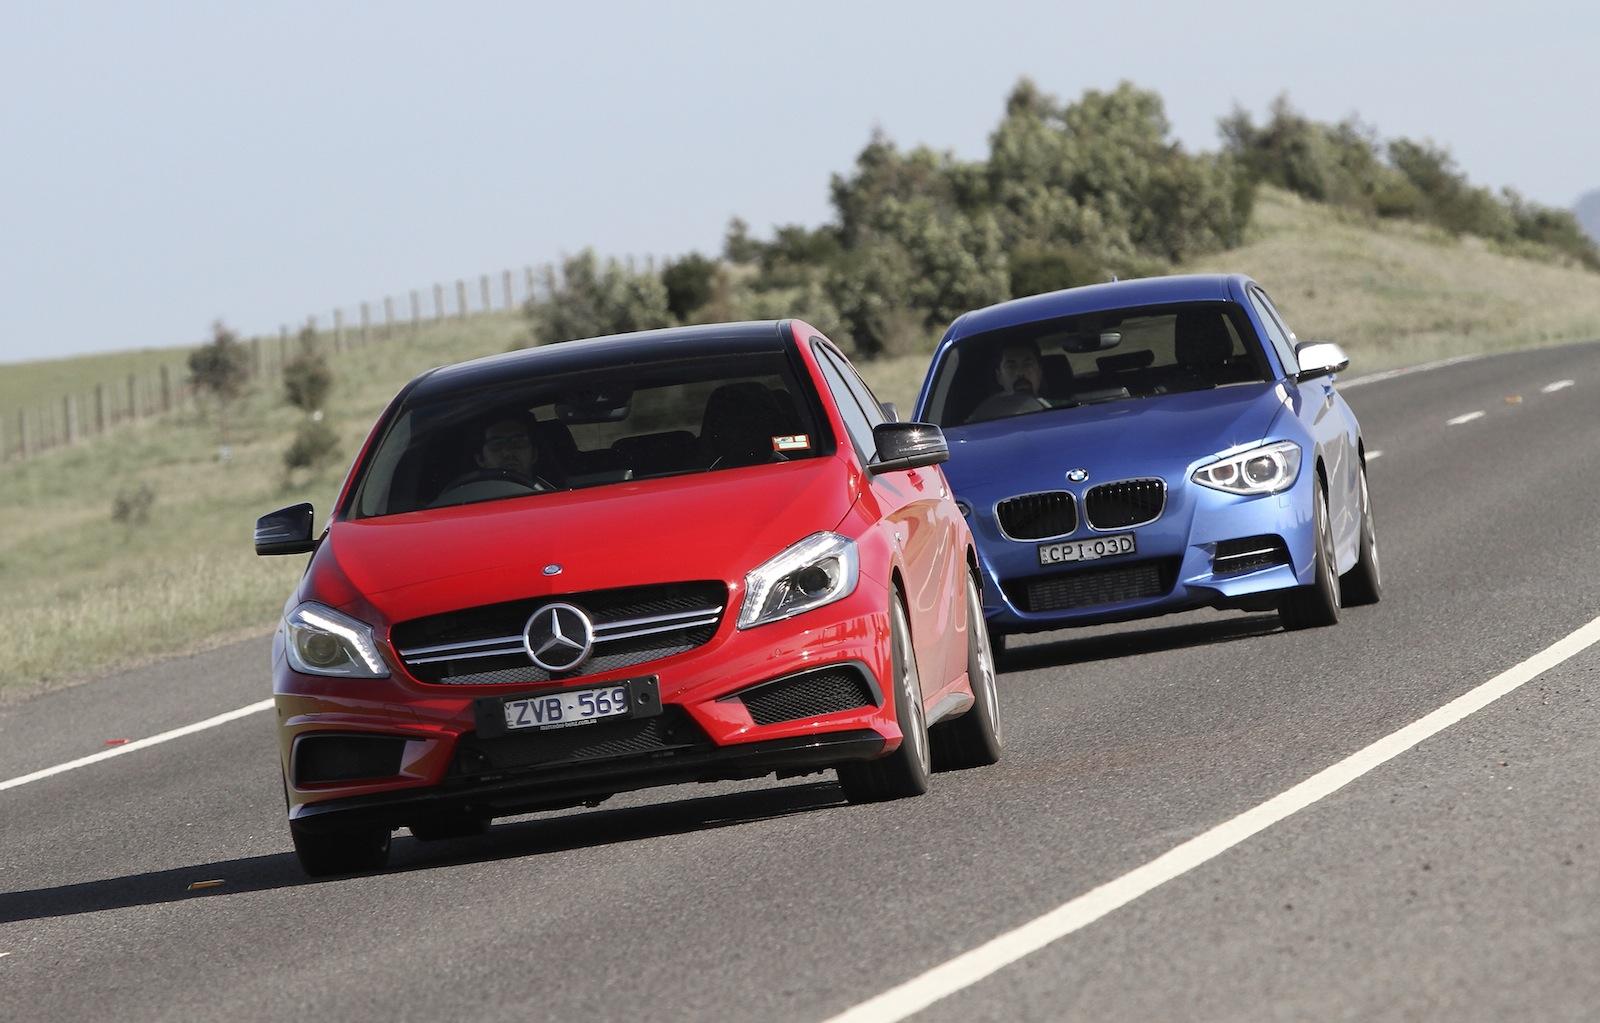 2013 BMW M135i vs Mercedes-Benz A45 AMG Comparison Test by Car Advice - autoevolution